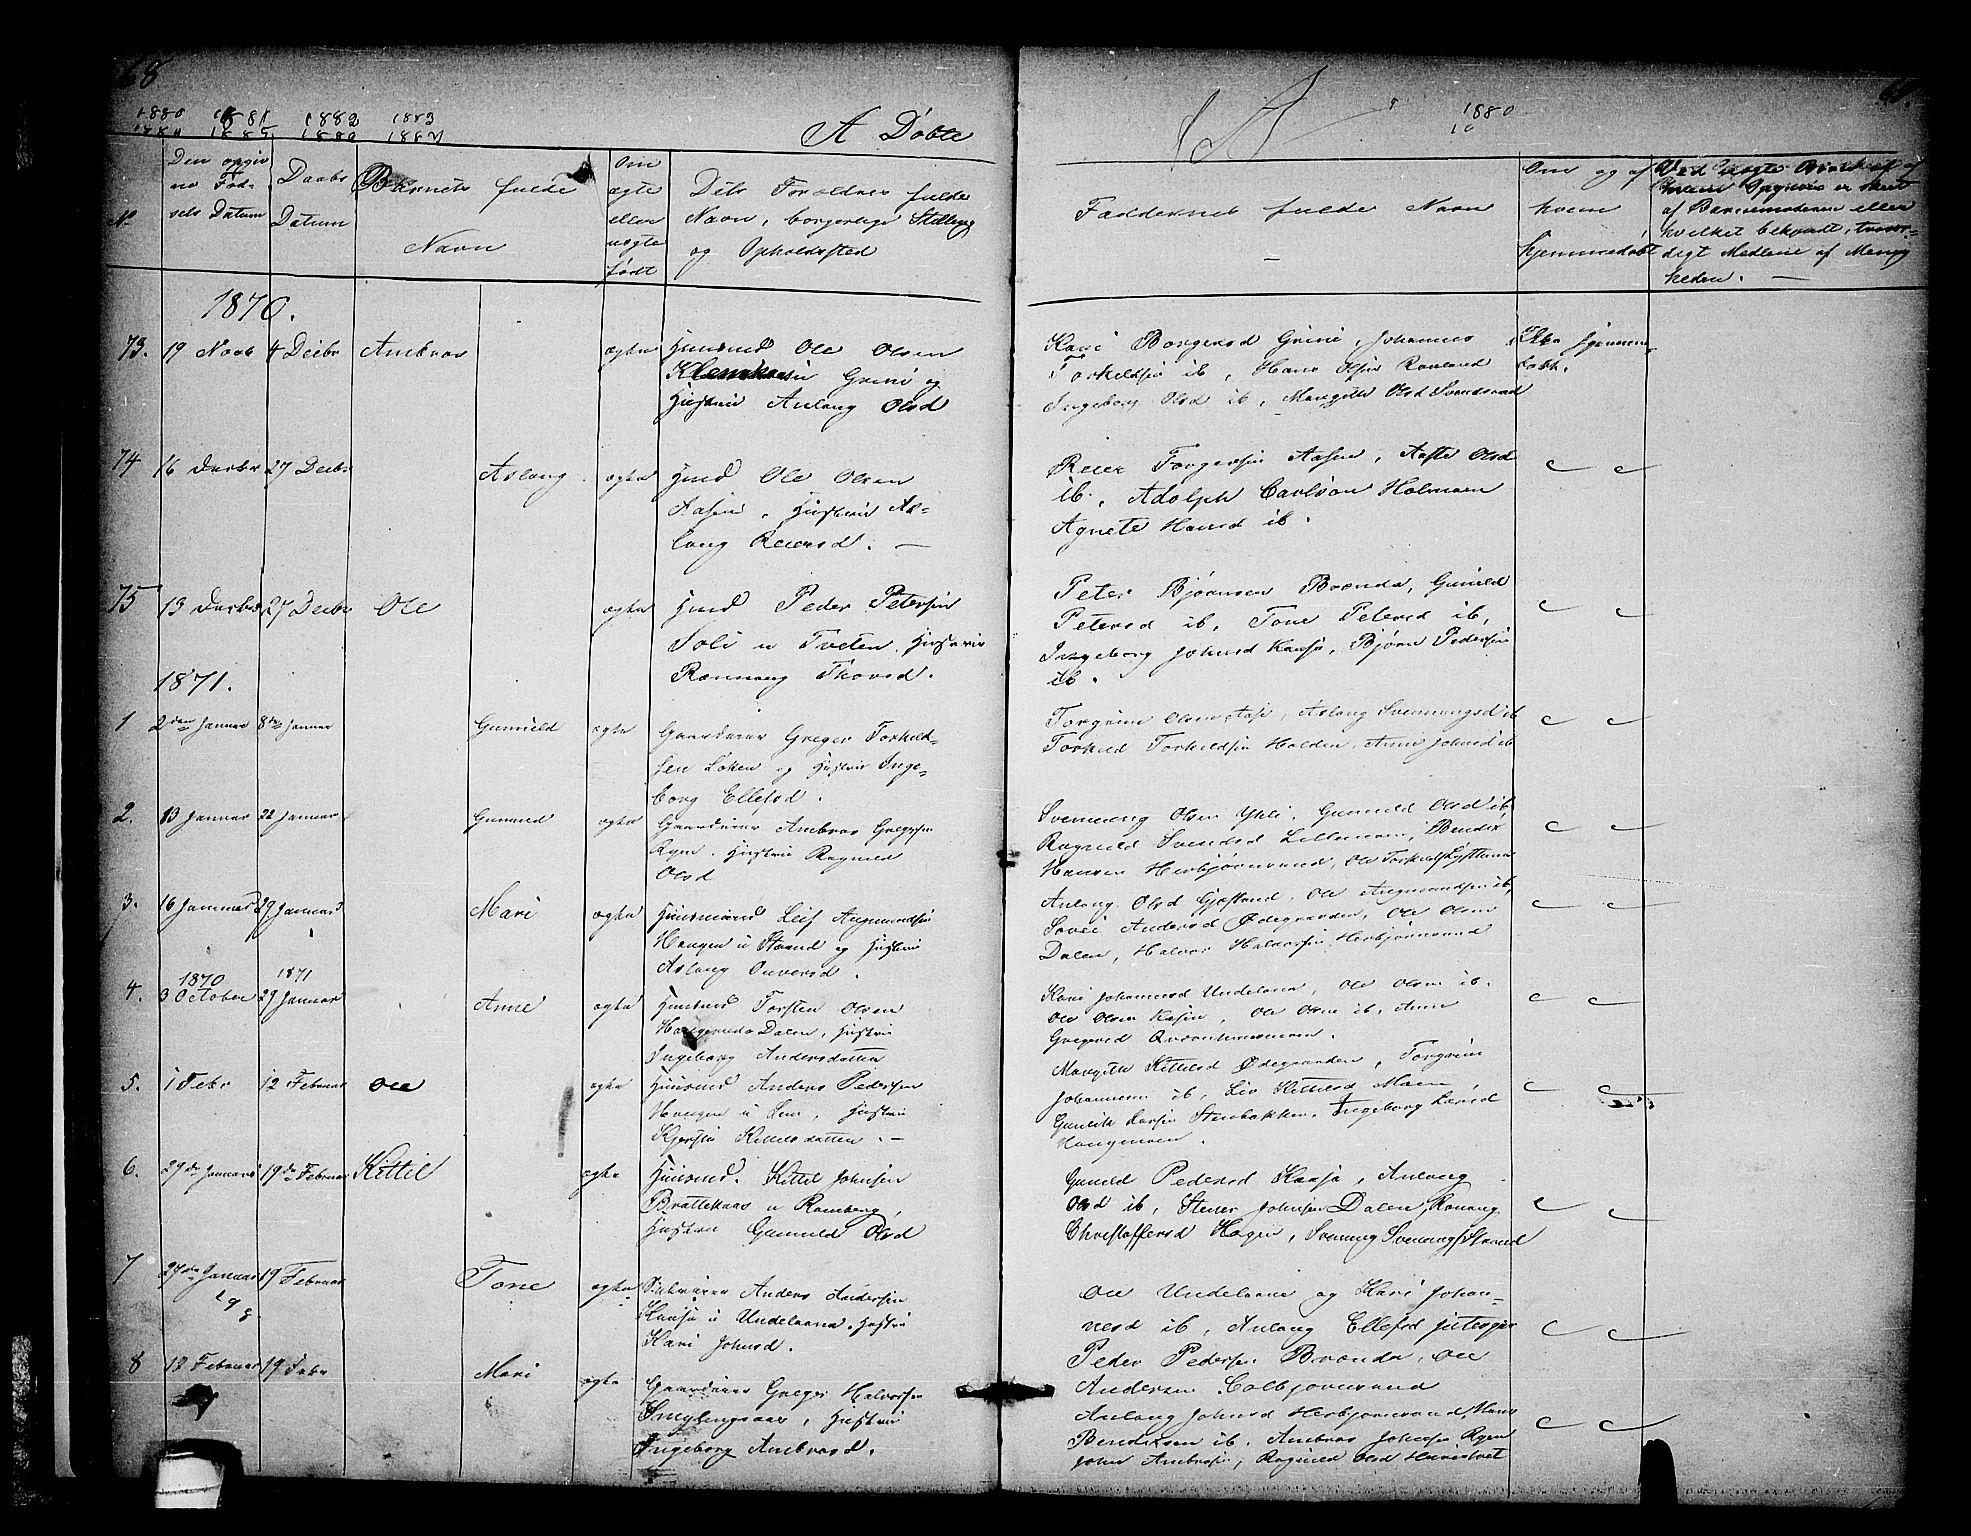 SAKO, Heddal kirkebøker, G/Ga/L0001: Klokkerbok nr. I 1, 1866-1878, s. 68-69